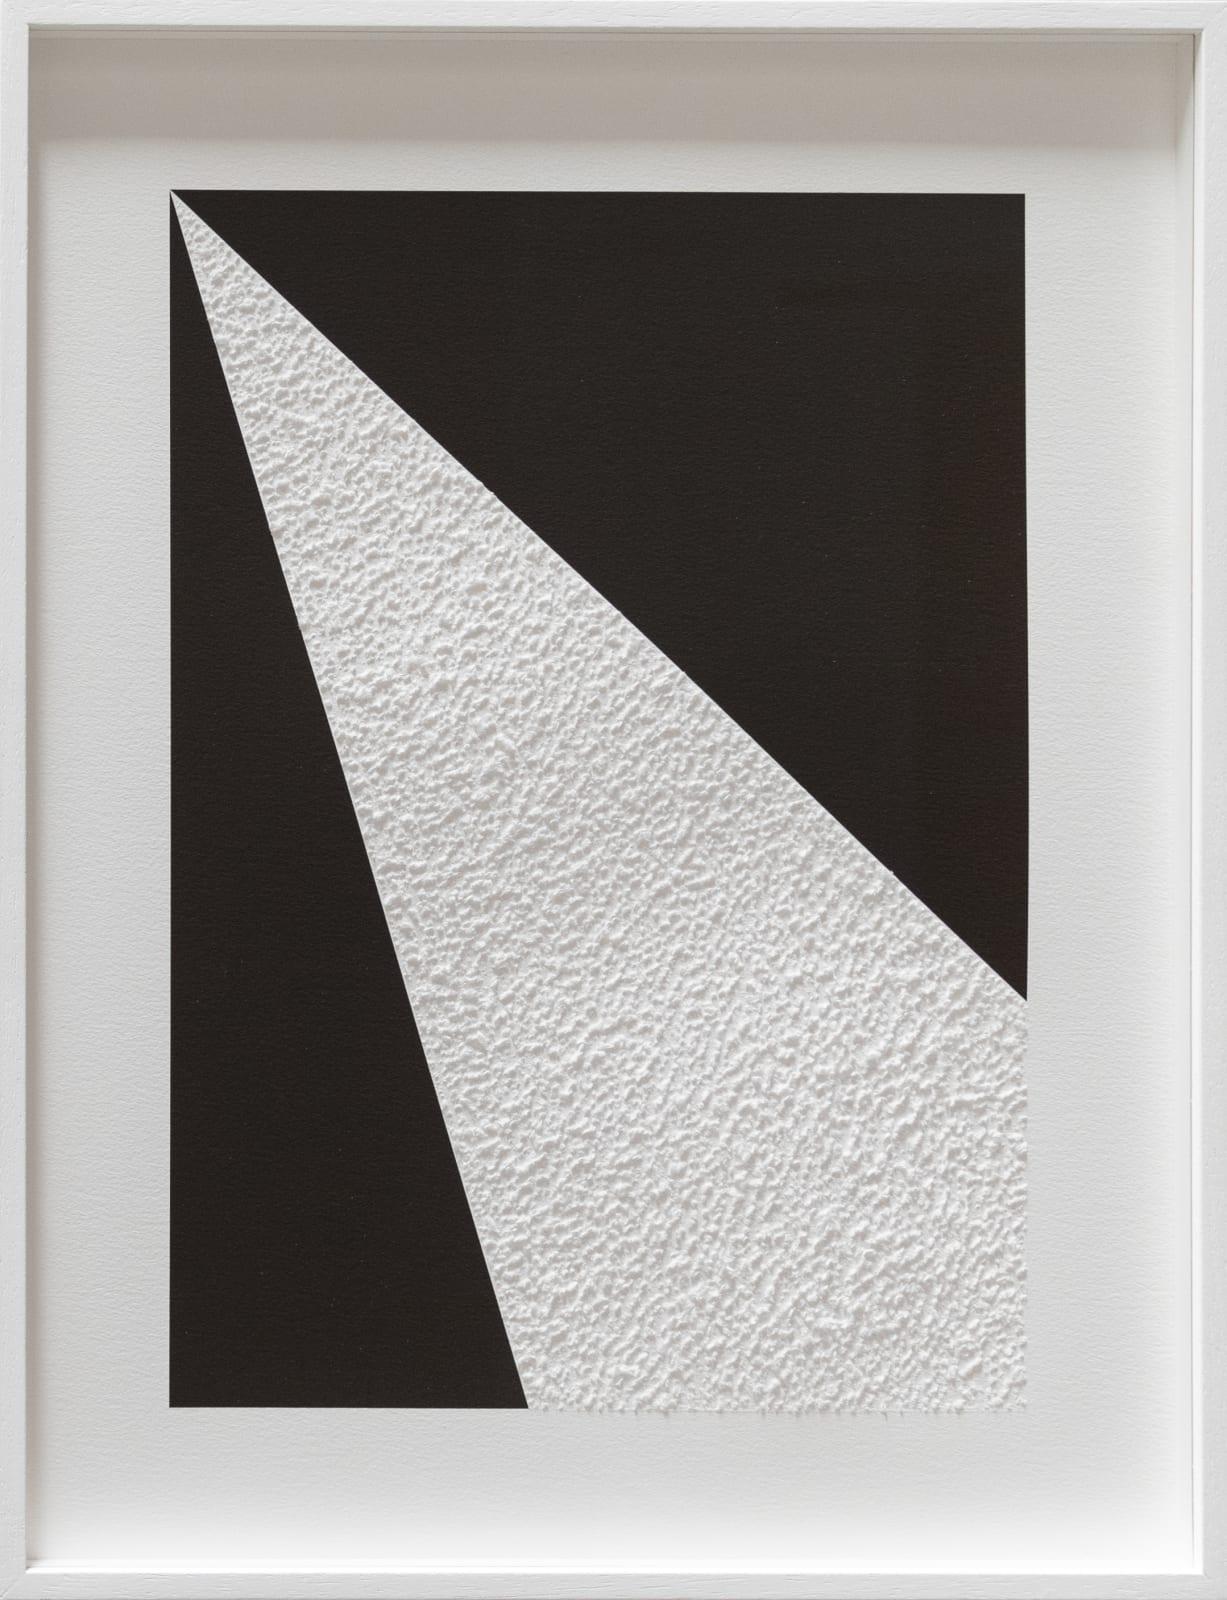 Mohammed Kazem, Sound of Angles No 15, 2020